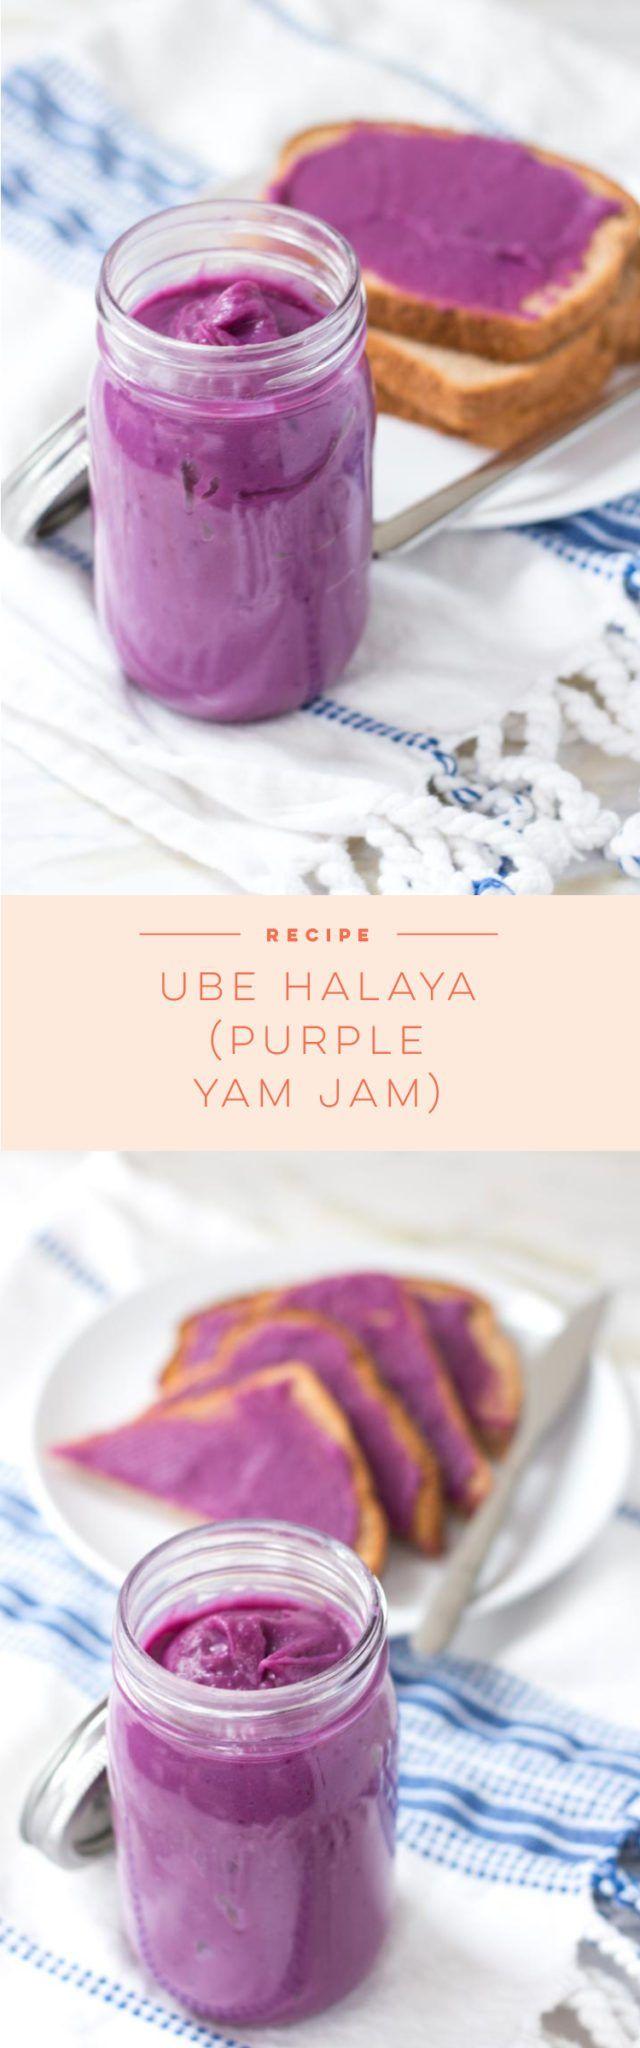 Easy recipe to make Ube Halaya or purple yam spread.